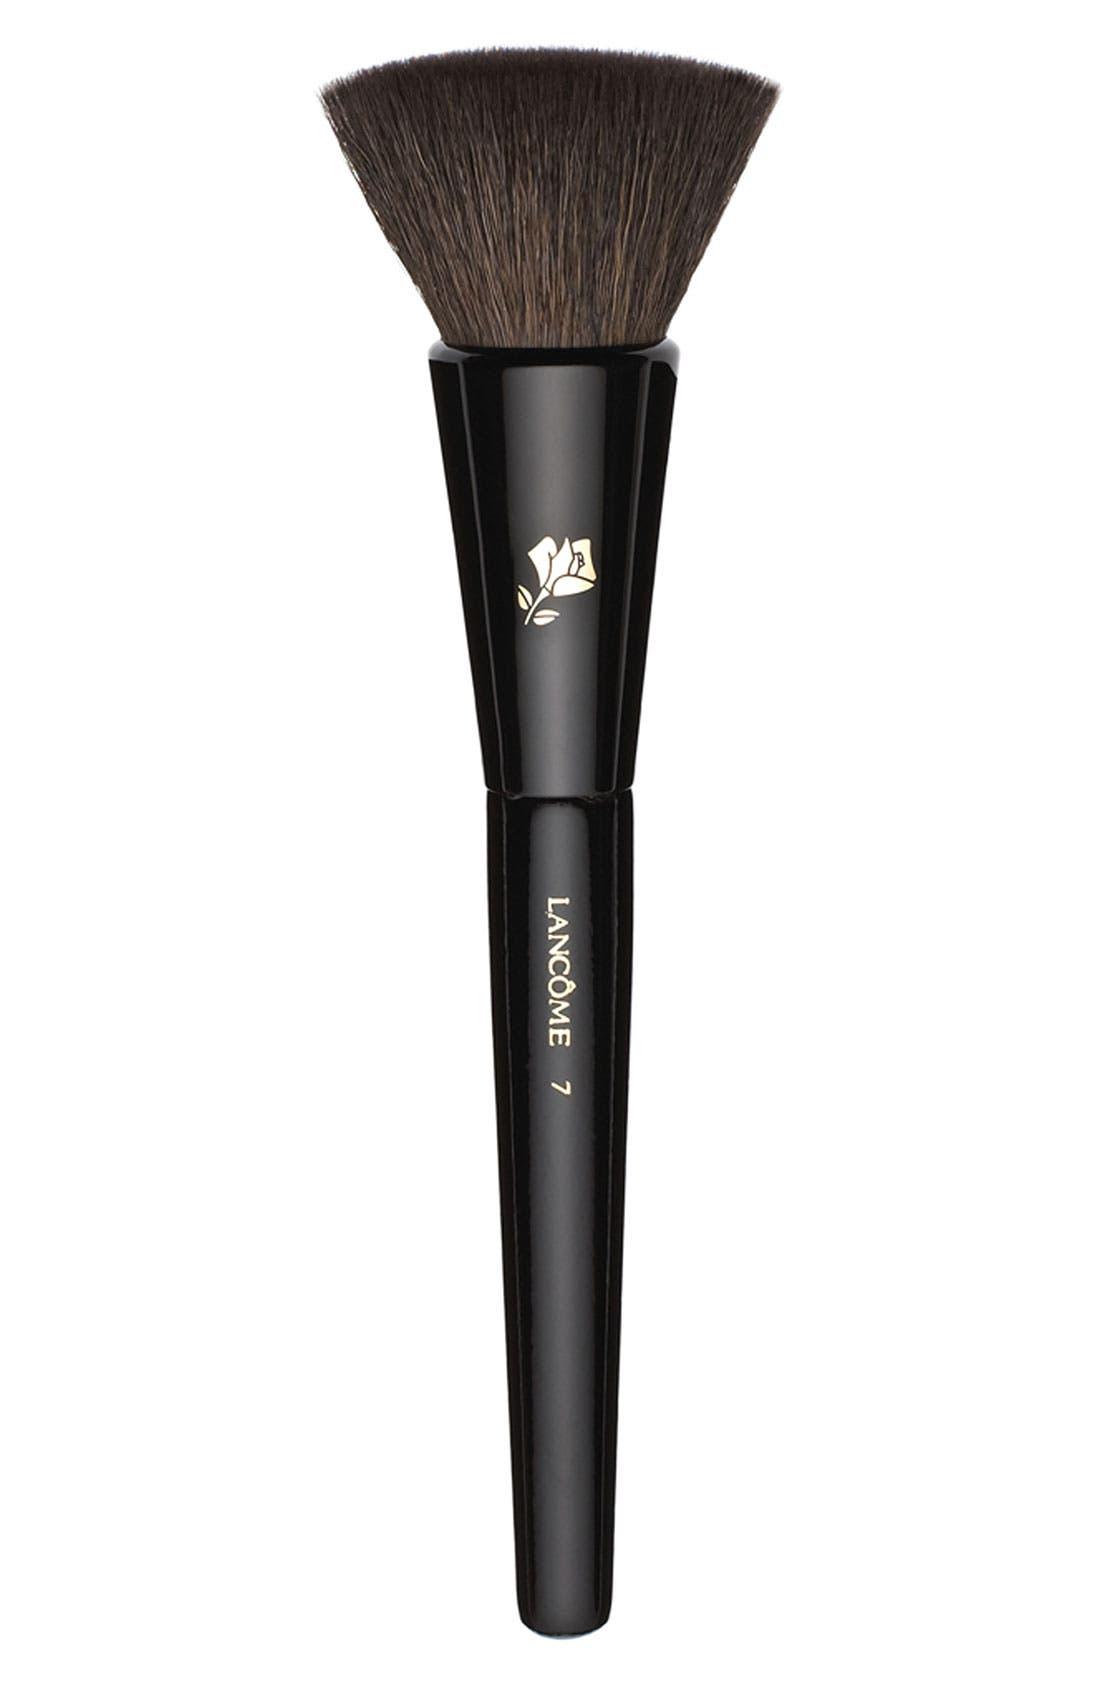 Lancôme Natural and Flat-Bristled Blush Brush